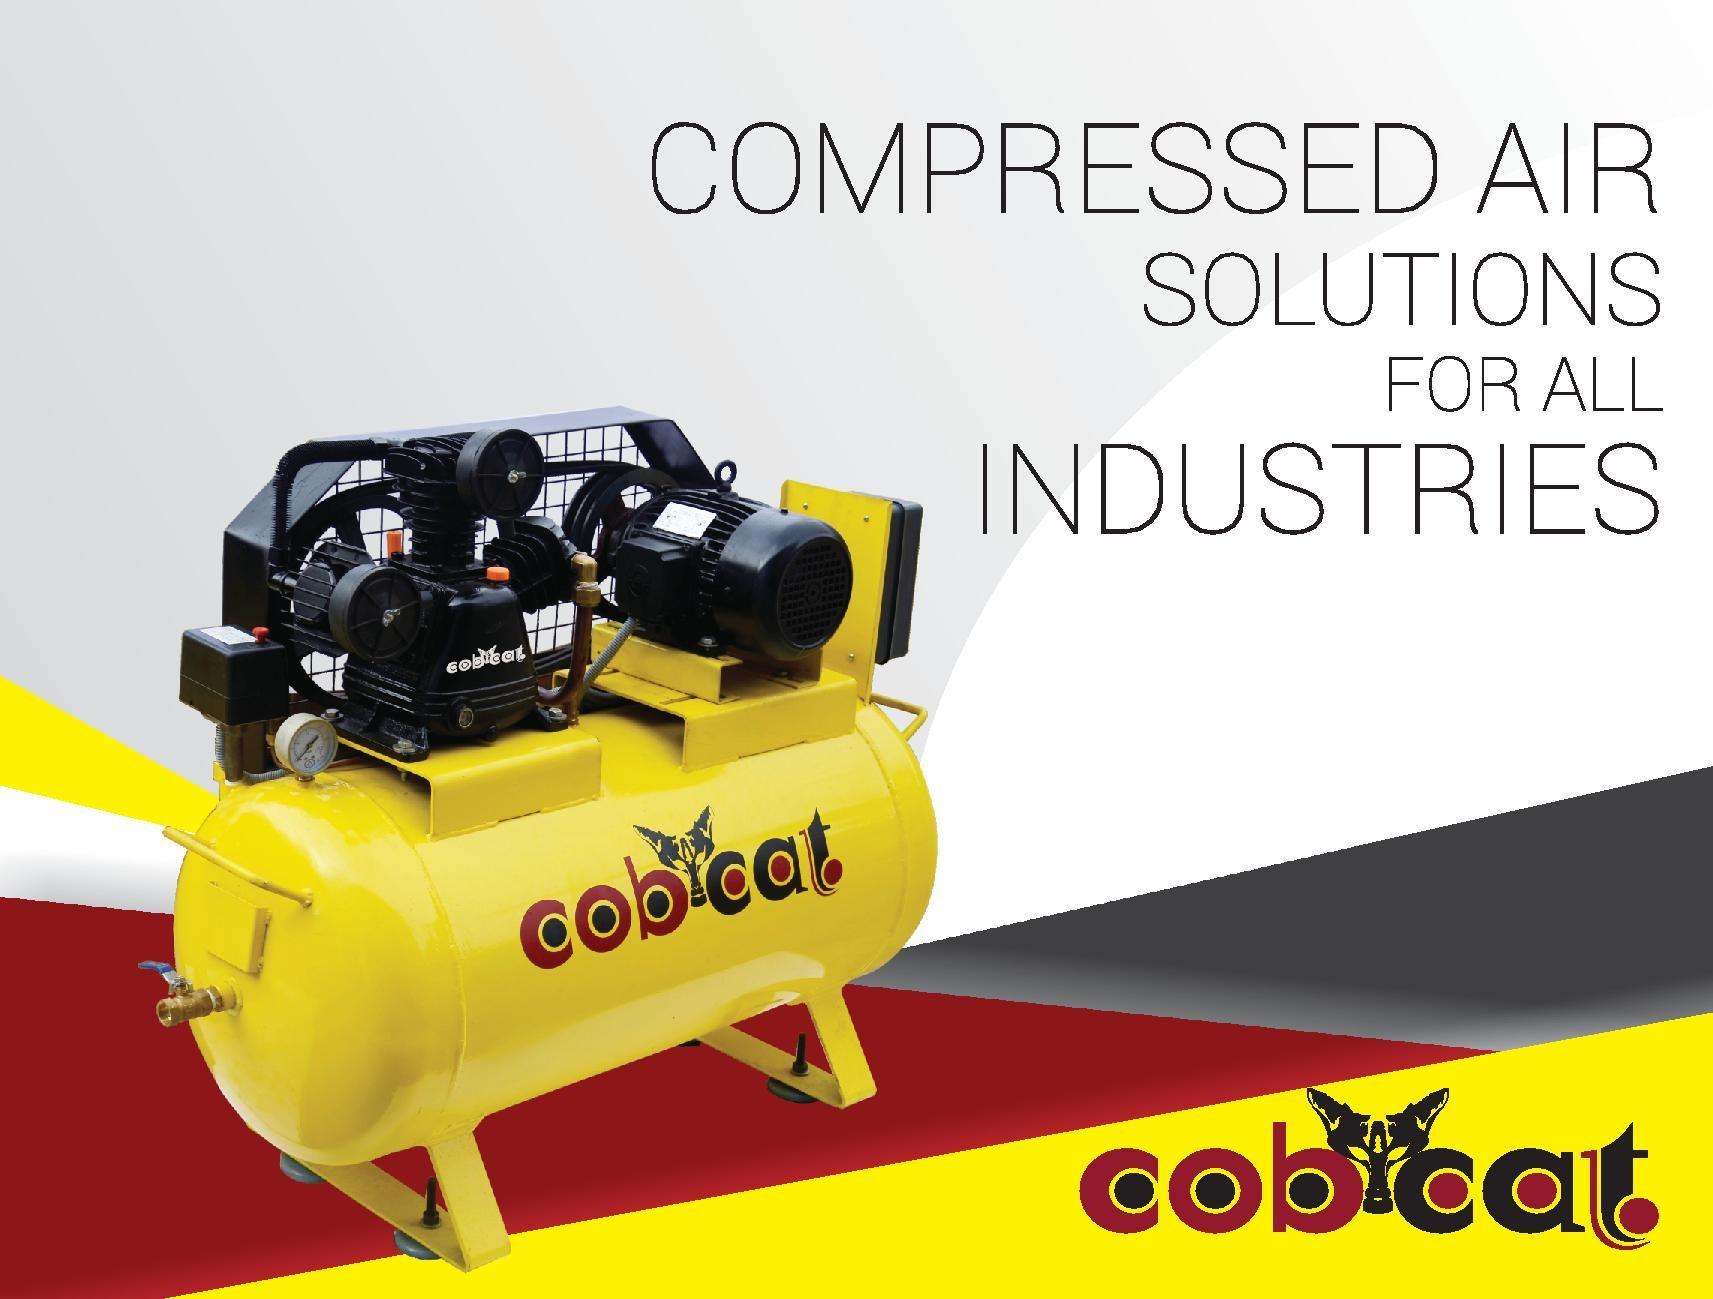 Pin by visagavel k on COBCAT | Air compressor, Vacuum pump, Air receiver